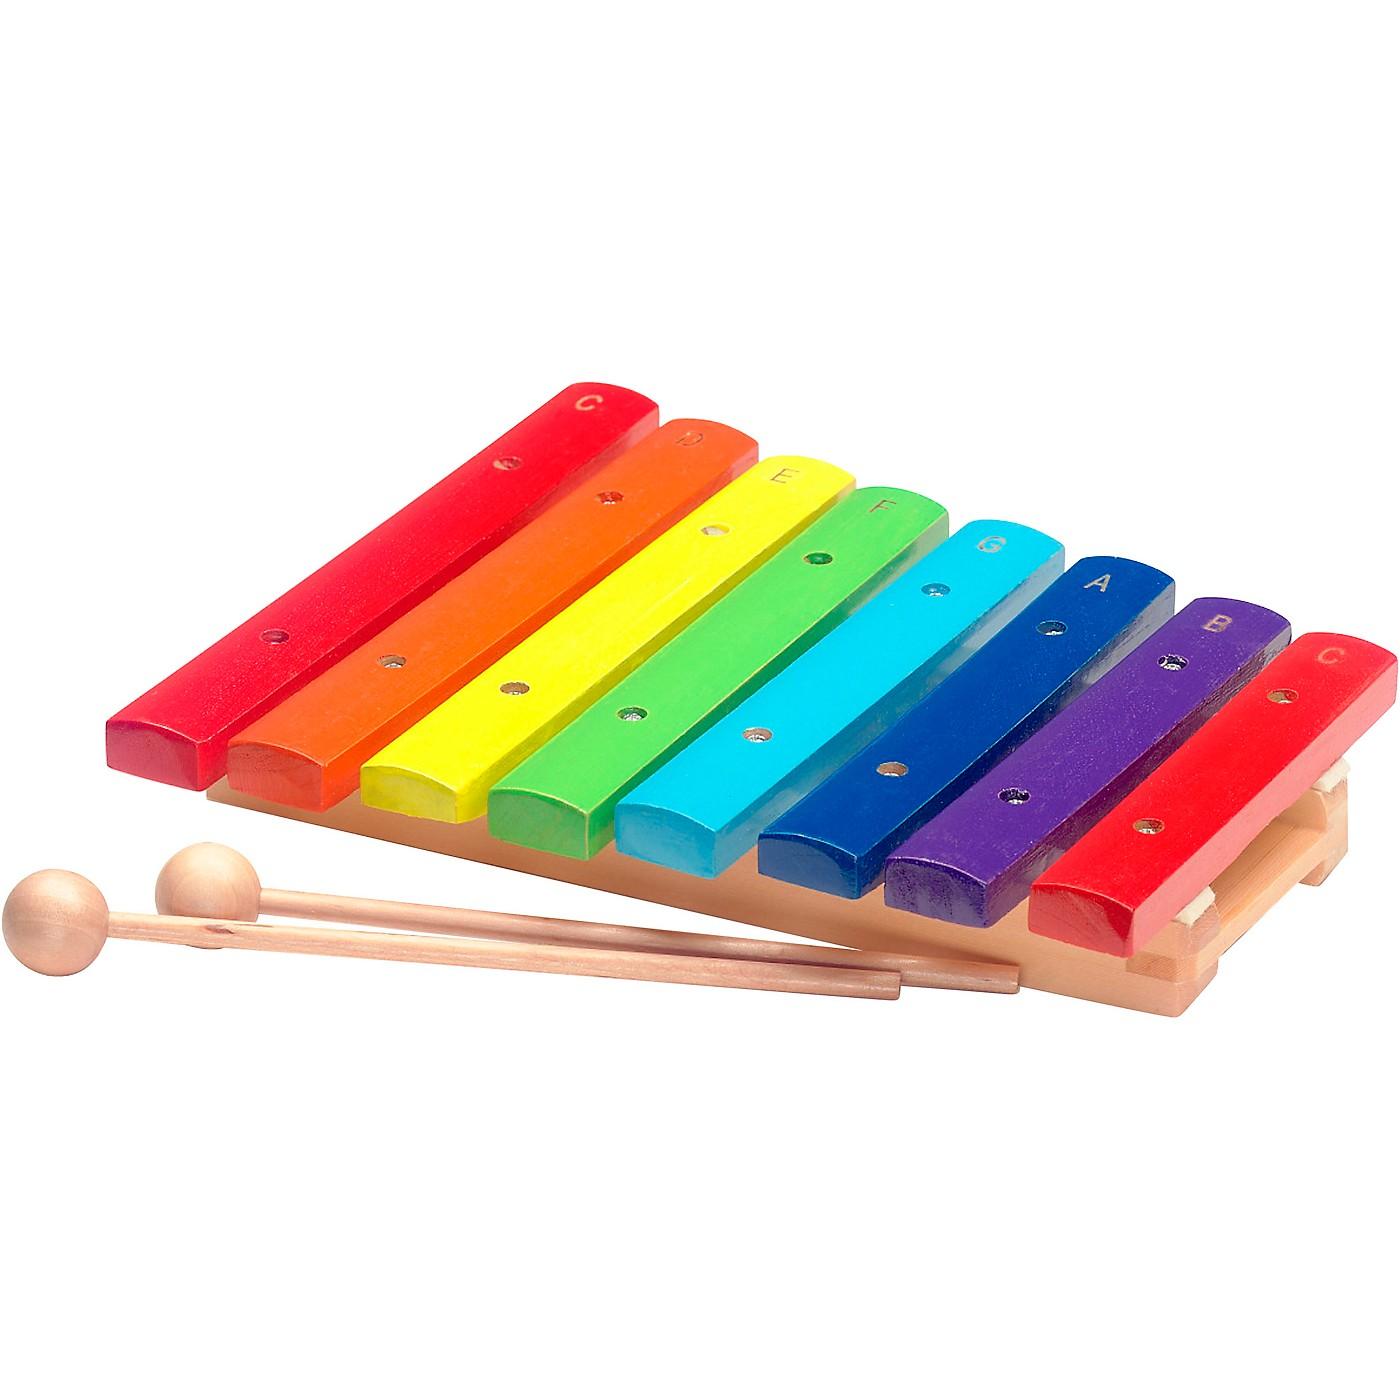 Stagg Rainbow Xylophone, 8 Keys, C-C thumbnail